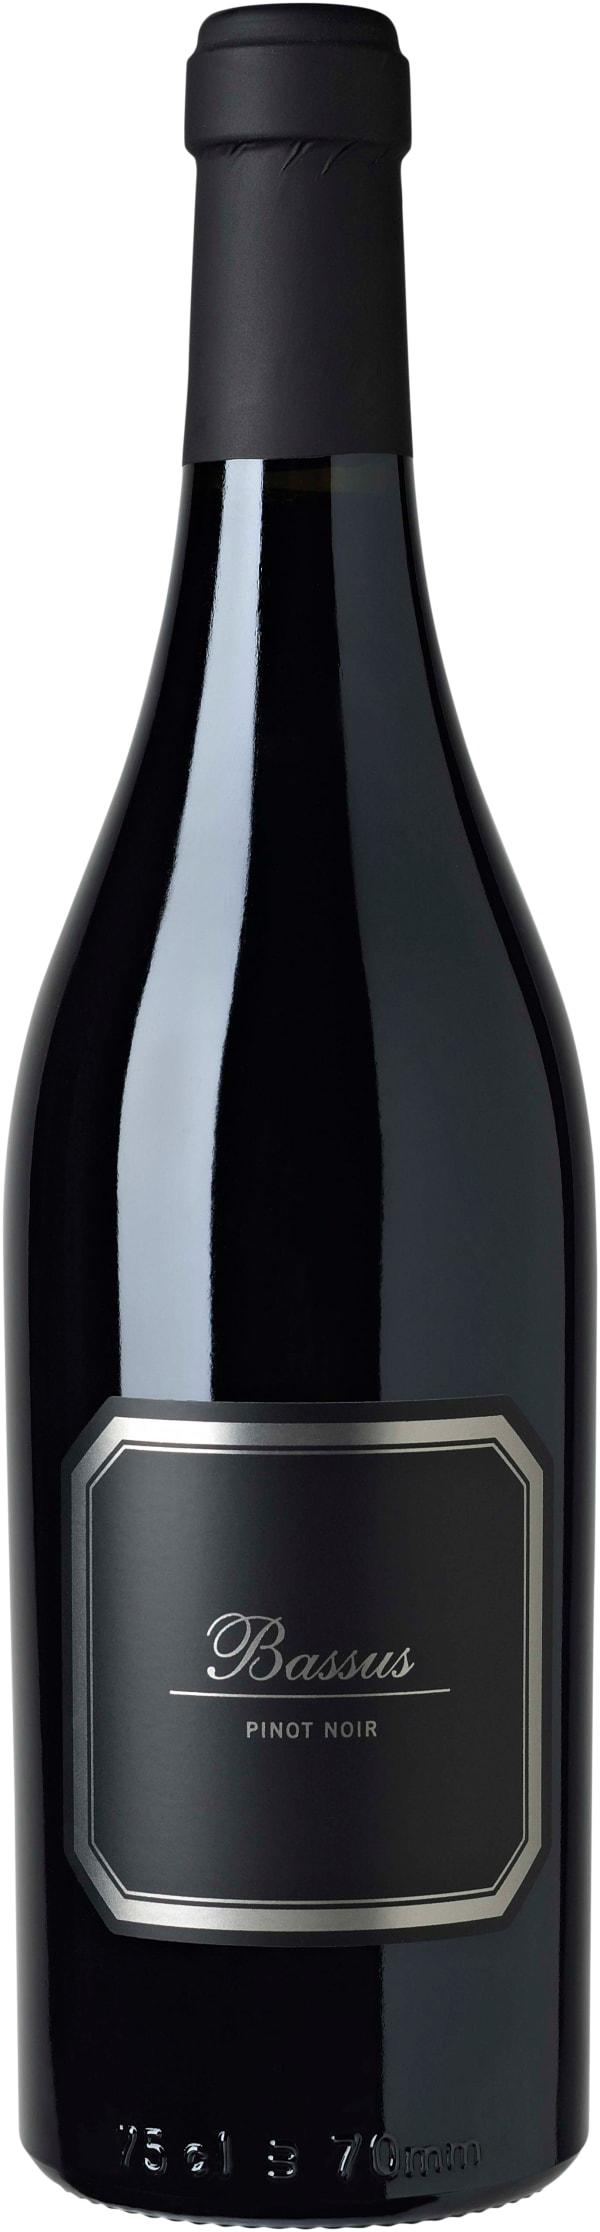 Hispano+Suizas Bassus Pinot Noir 2016